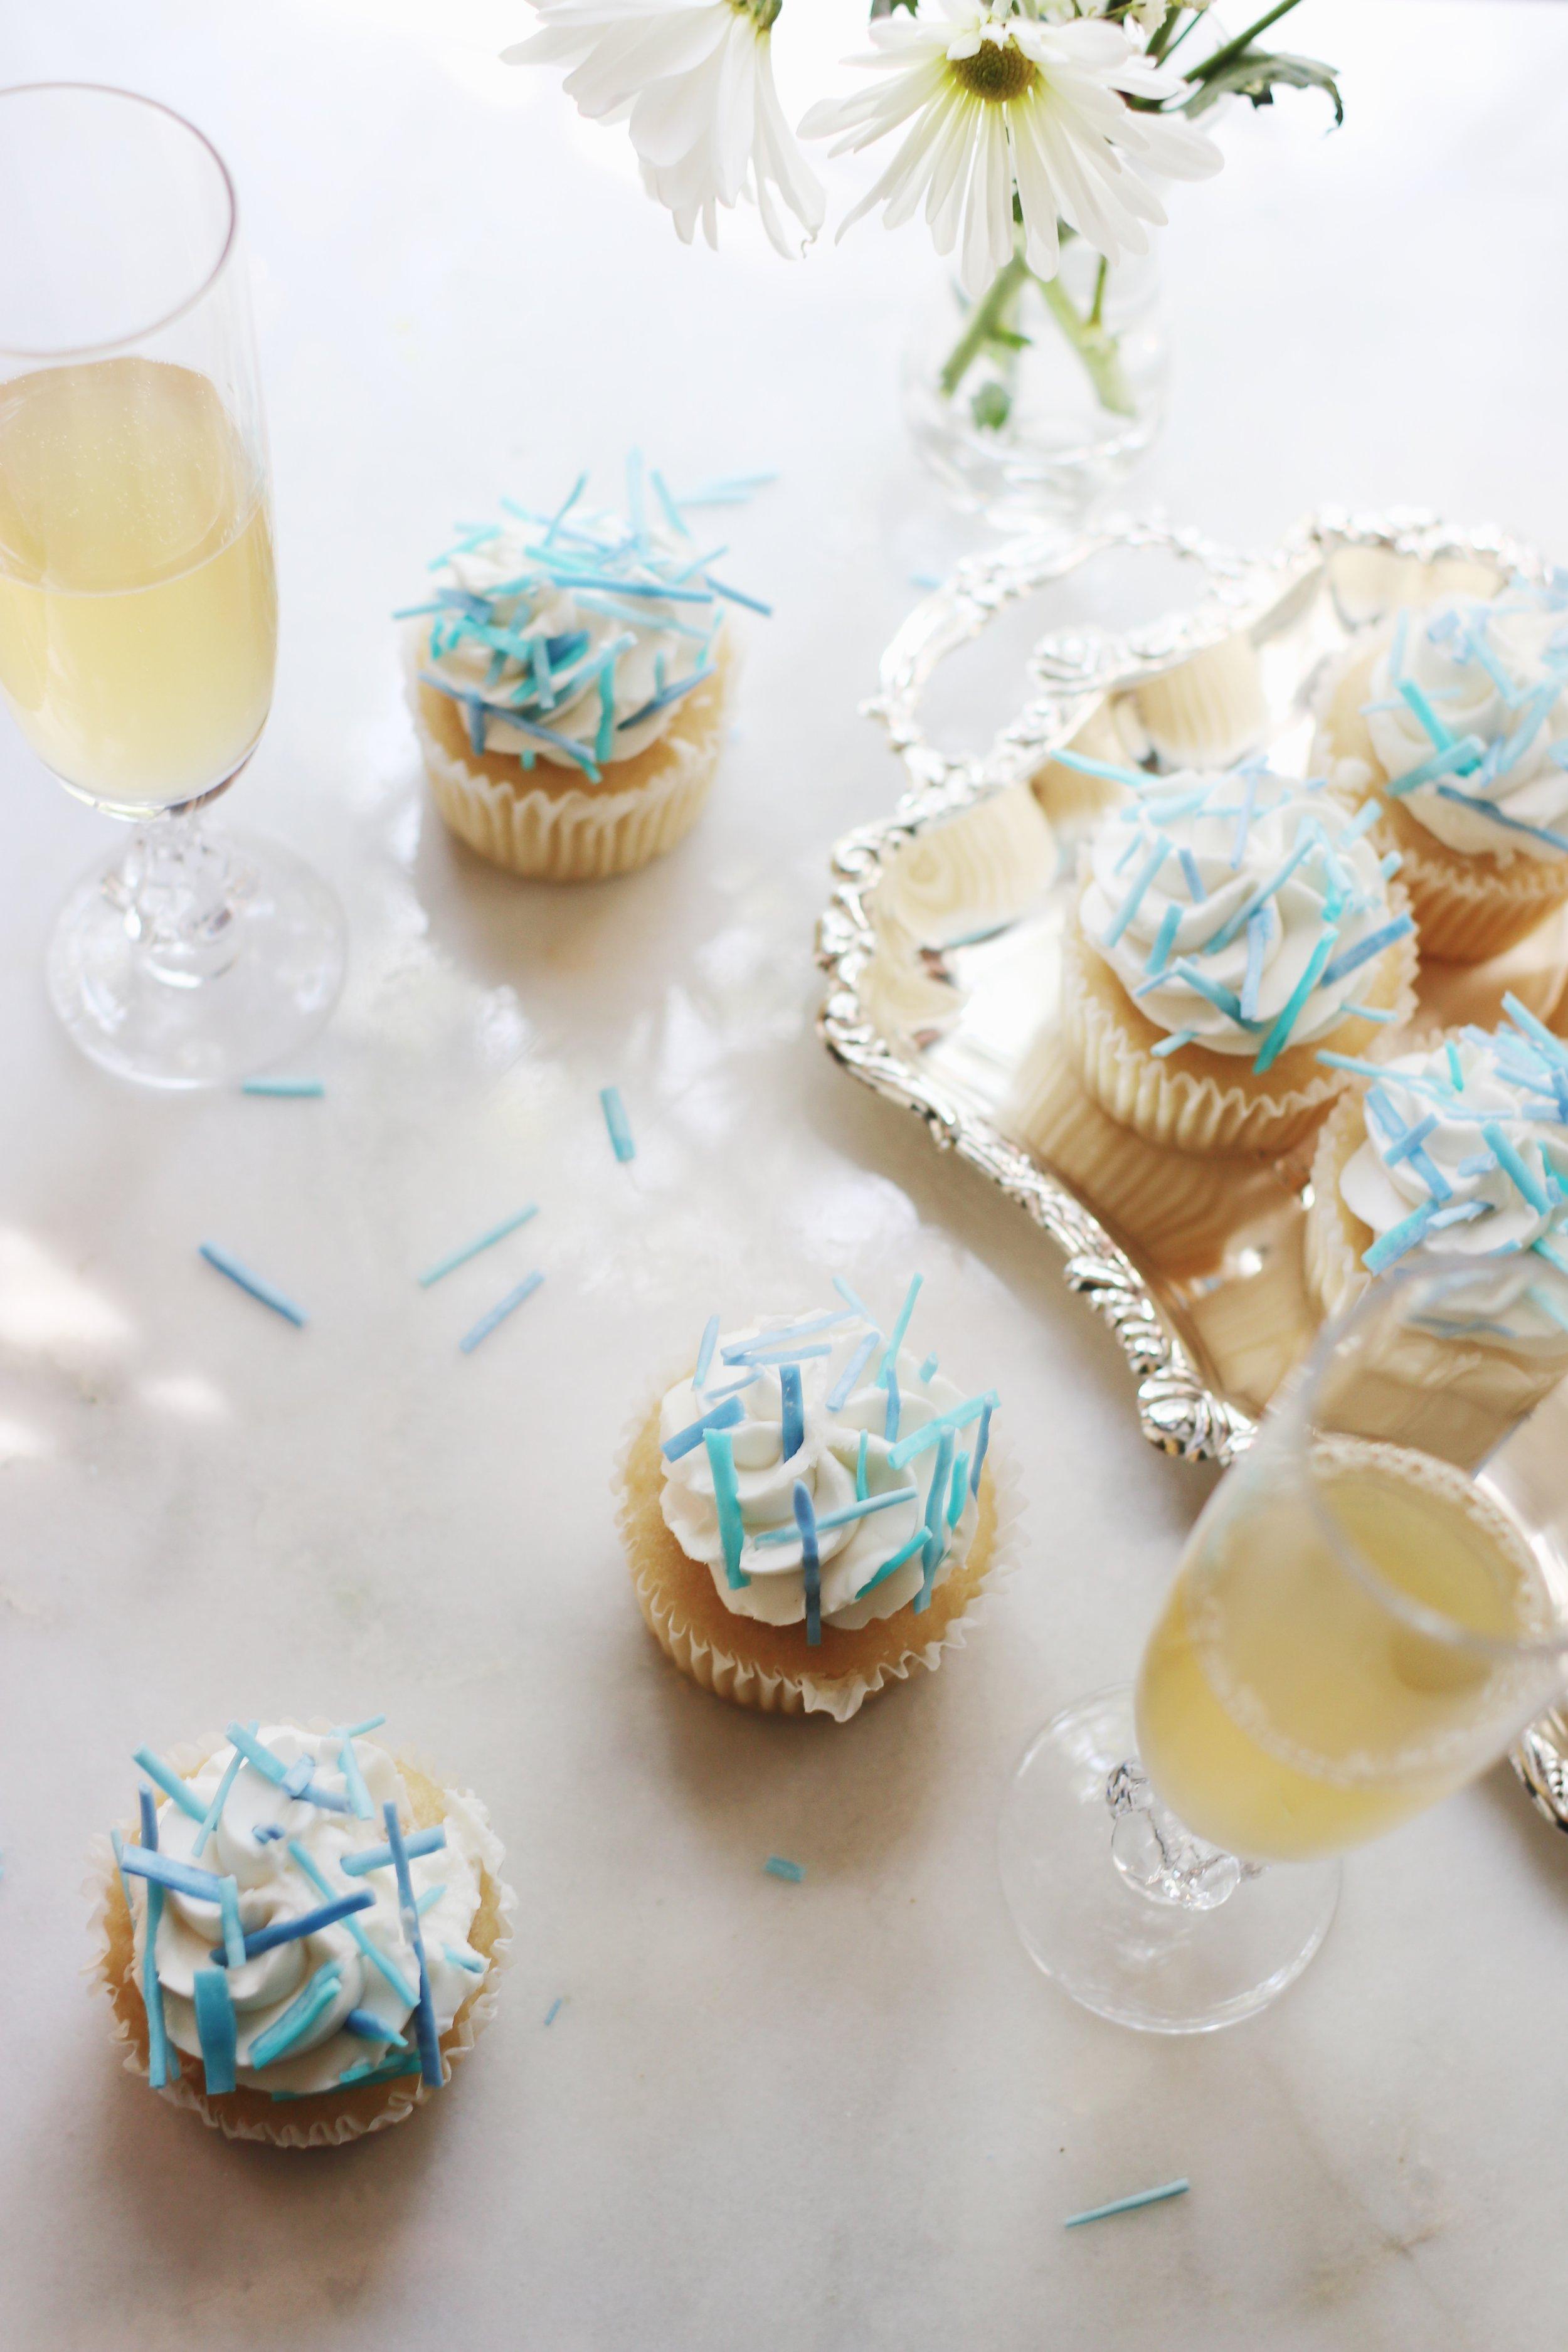 hanukkah-cupcakes-homemade-sprinkles-recipe-36.JPG